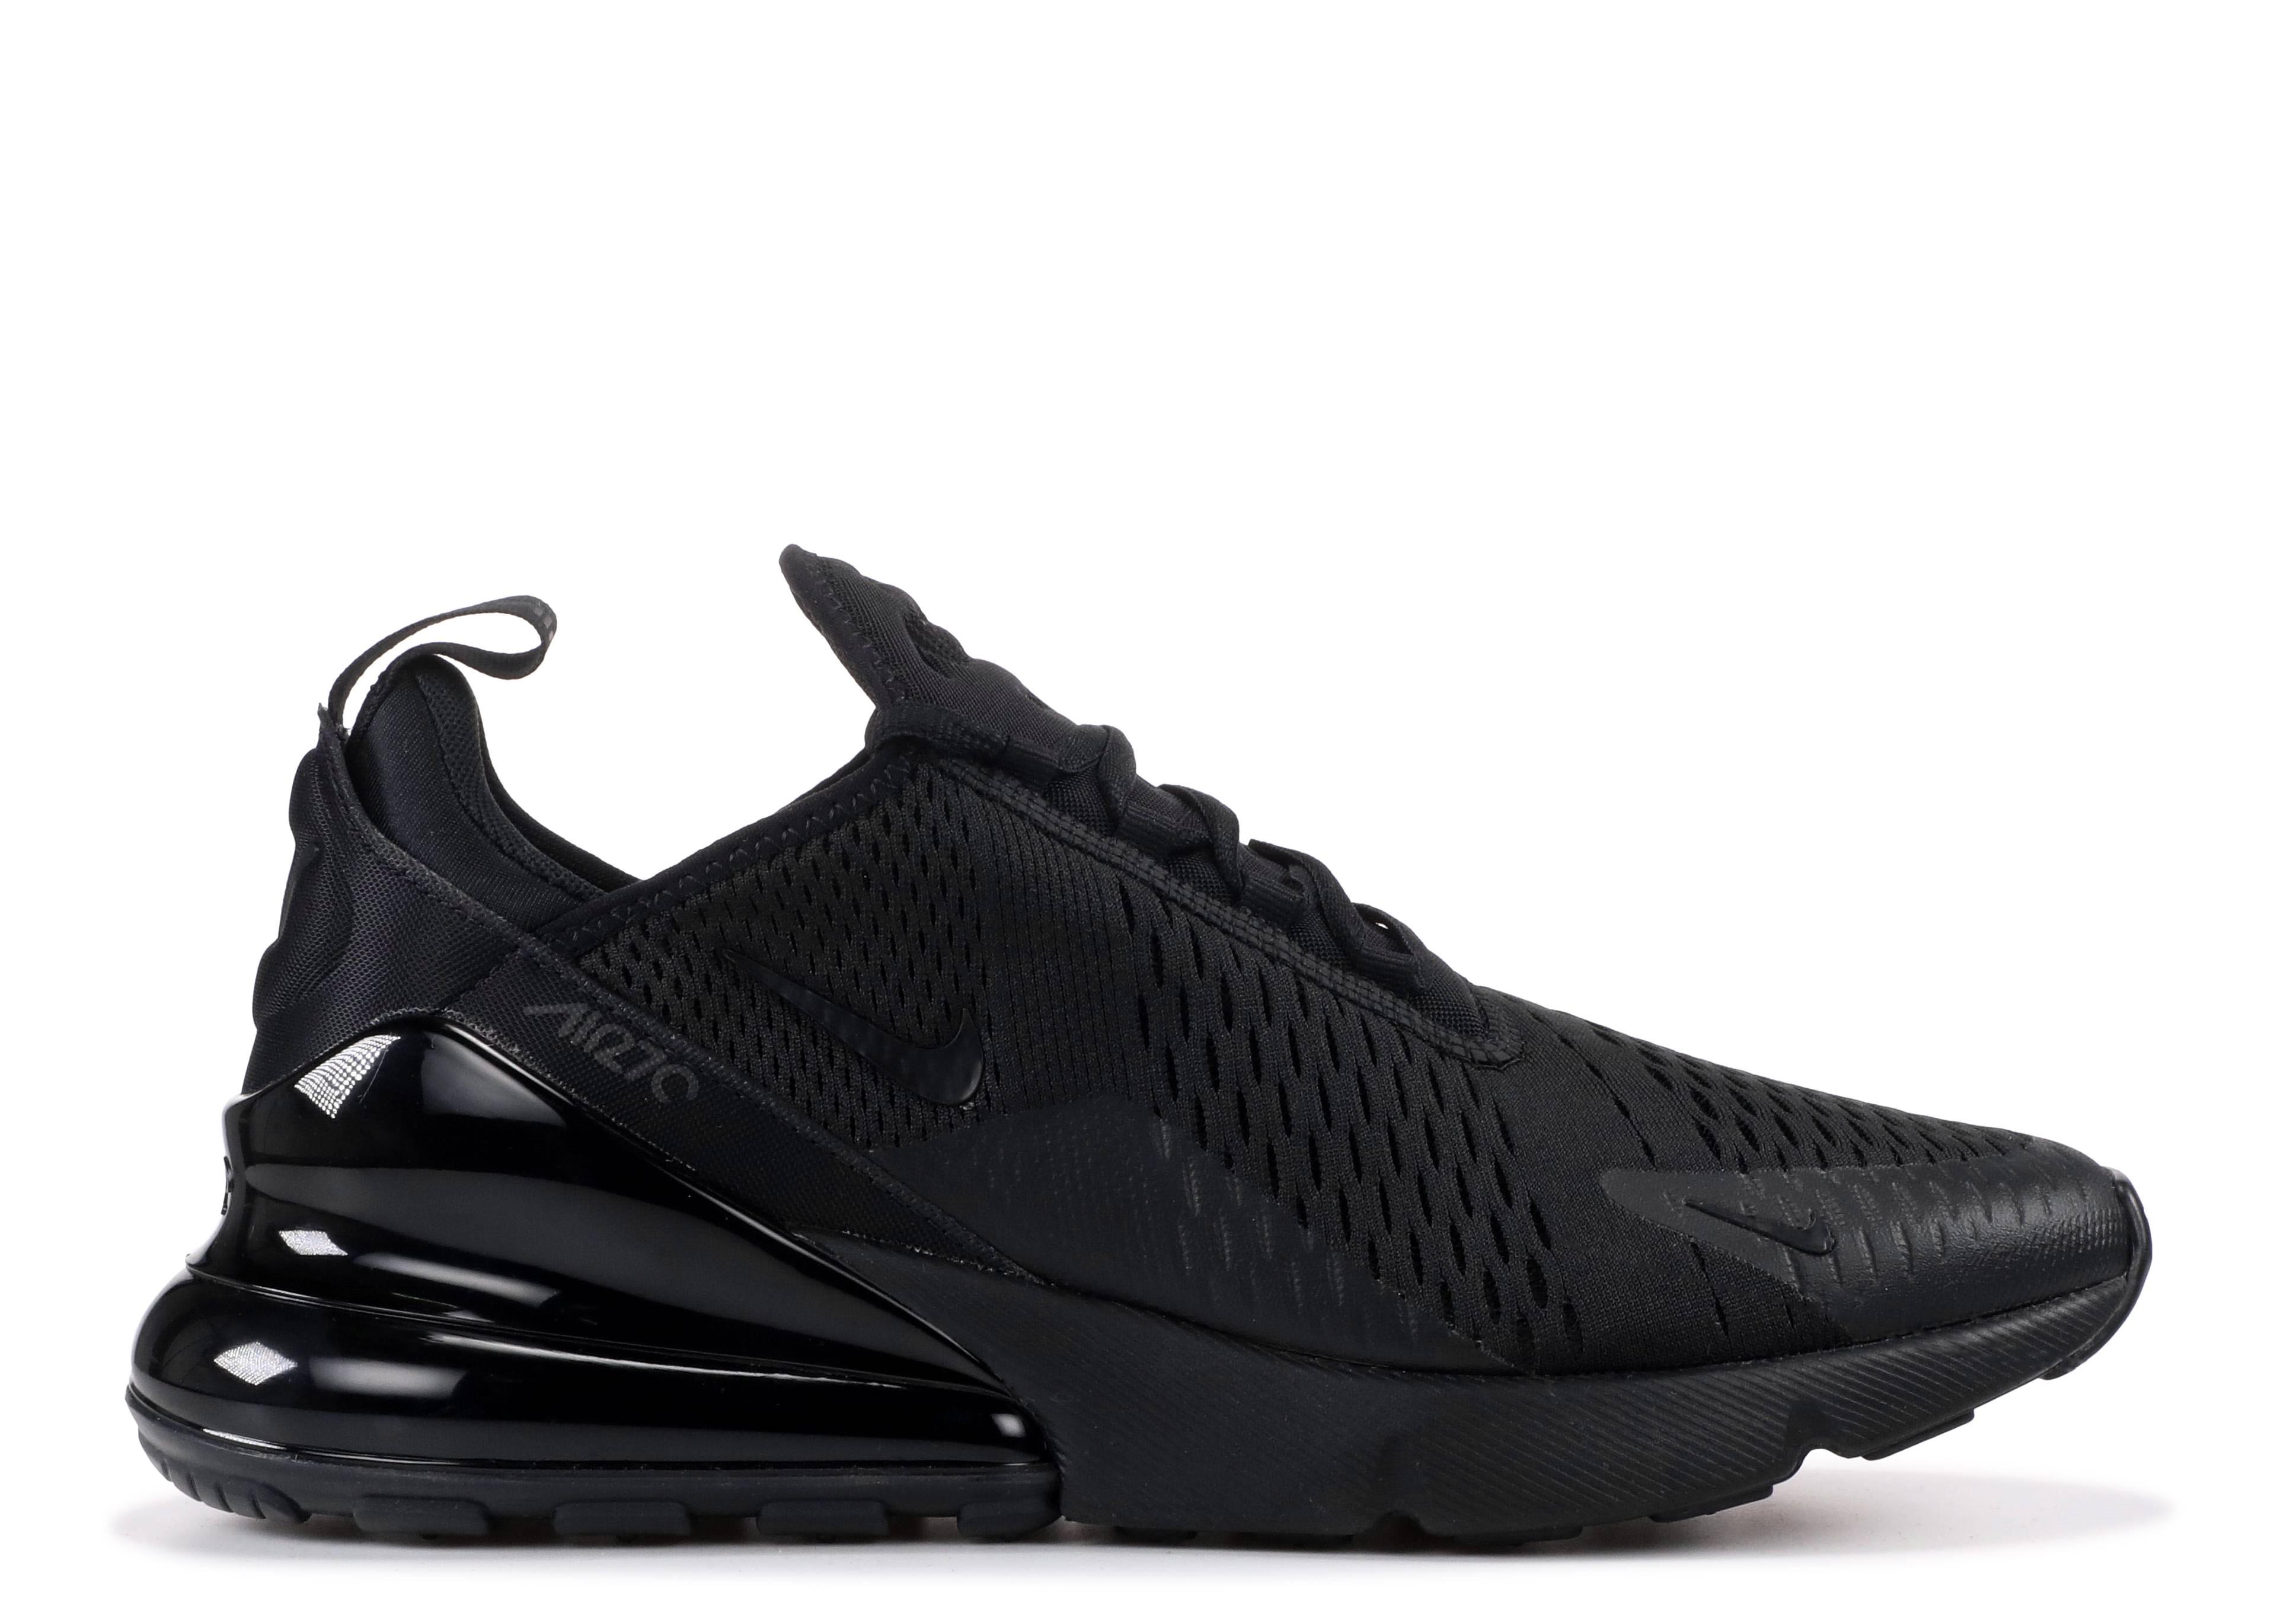 7203200fc95f Air Max 270 - Nike - AH8050 005 - black black-black